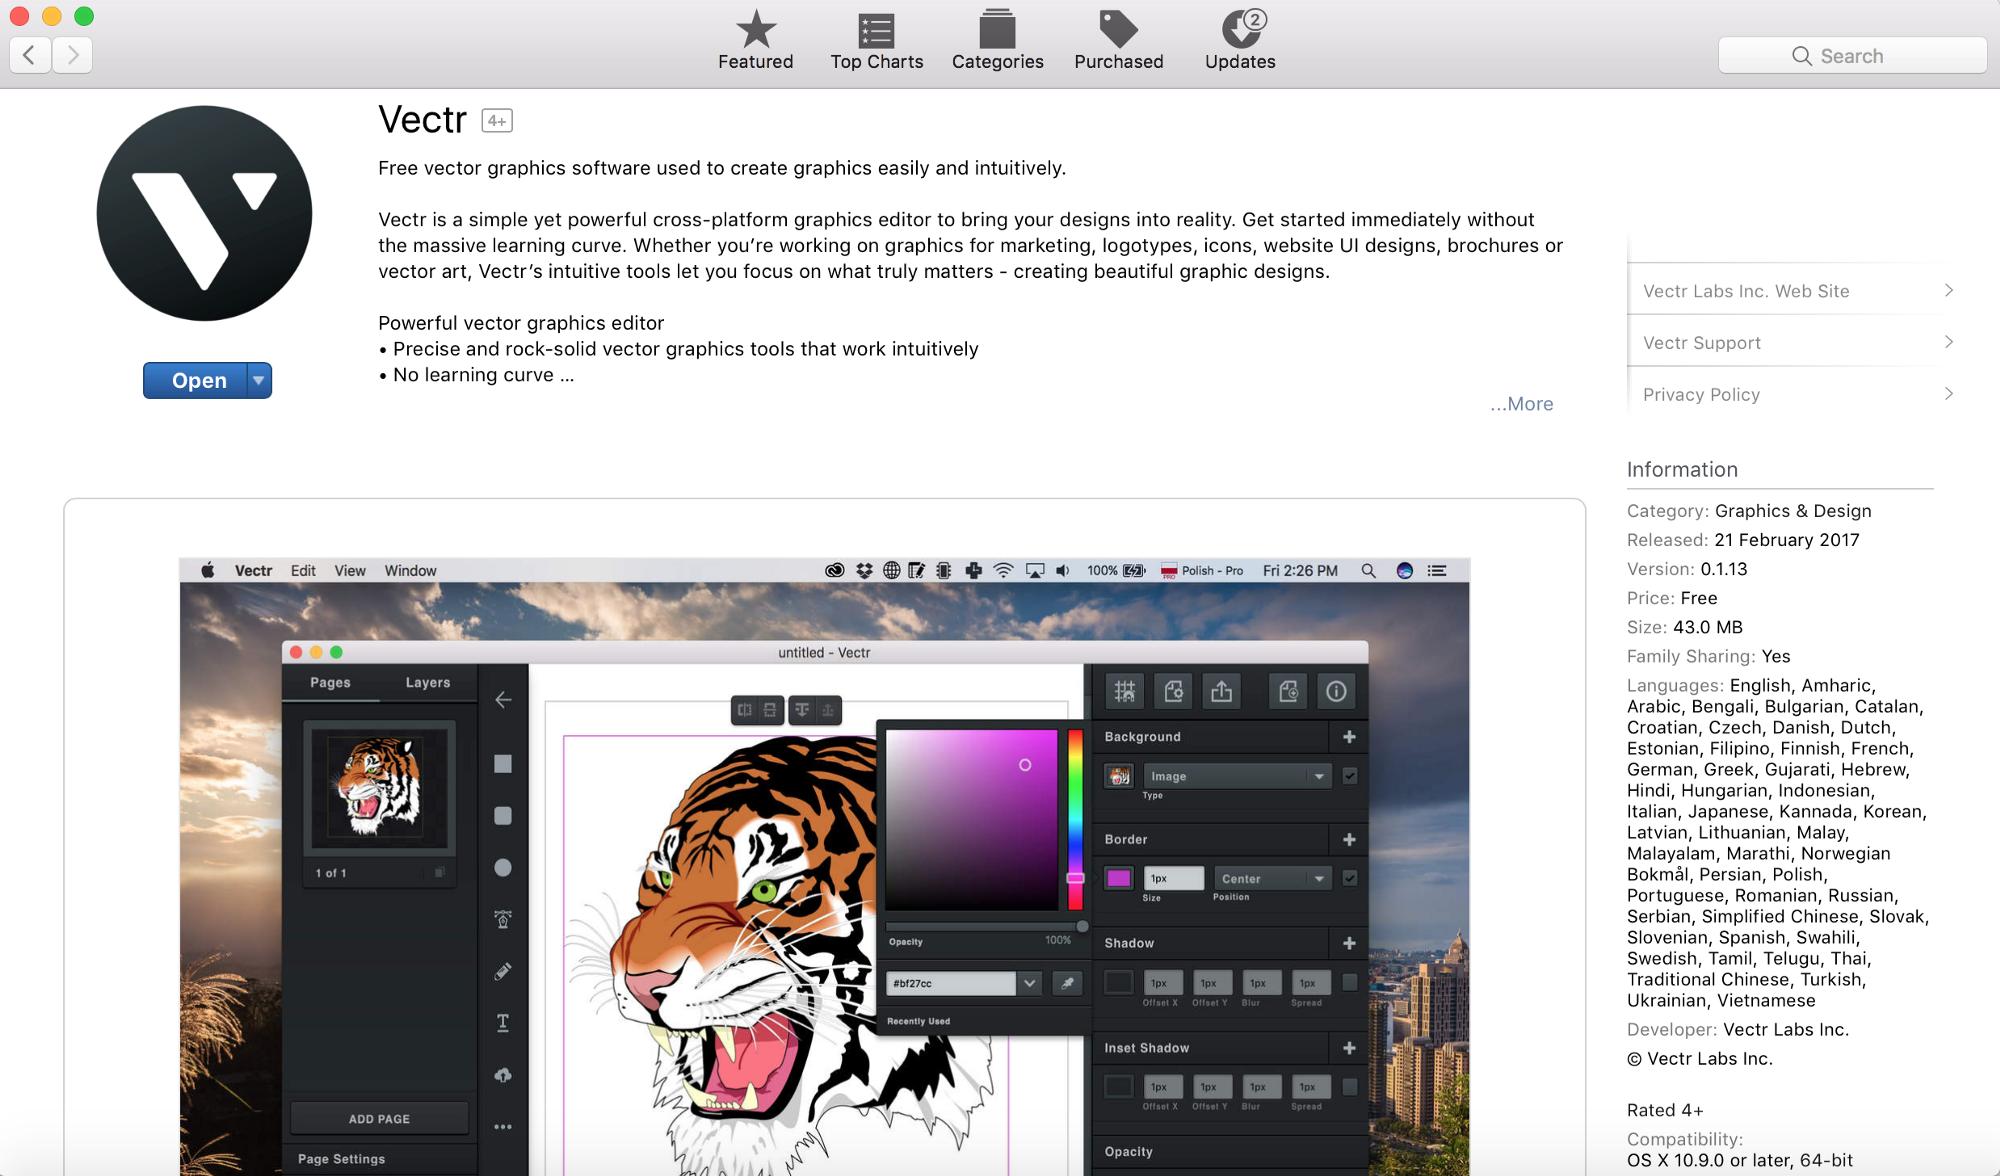 2000x1176 Vectr Free Vector Graphics Software Now @ Mac App Store